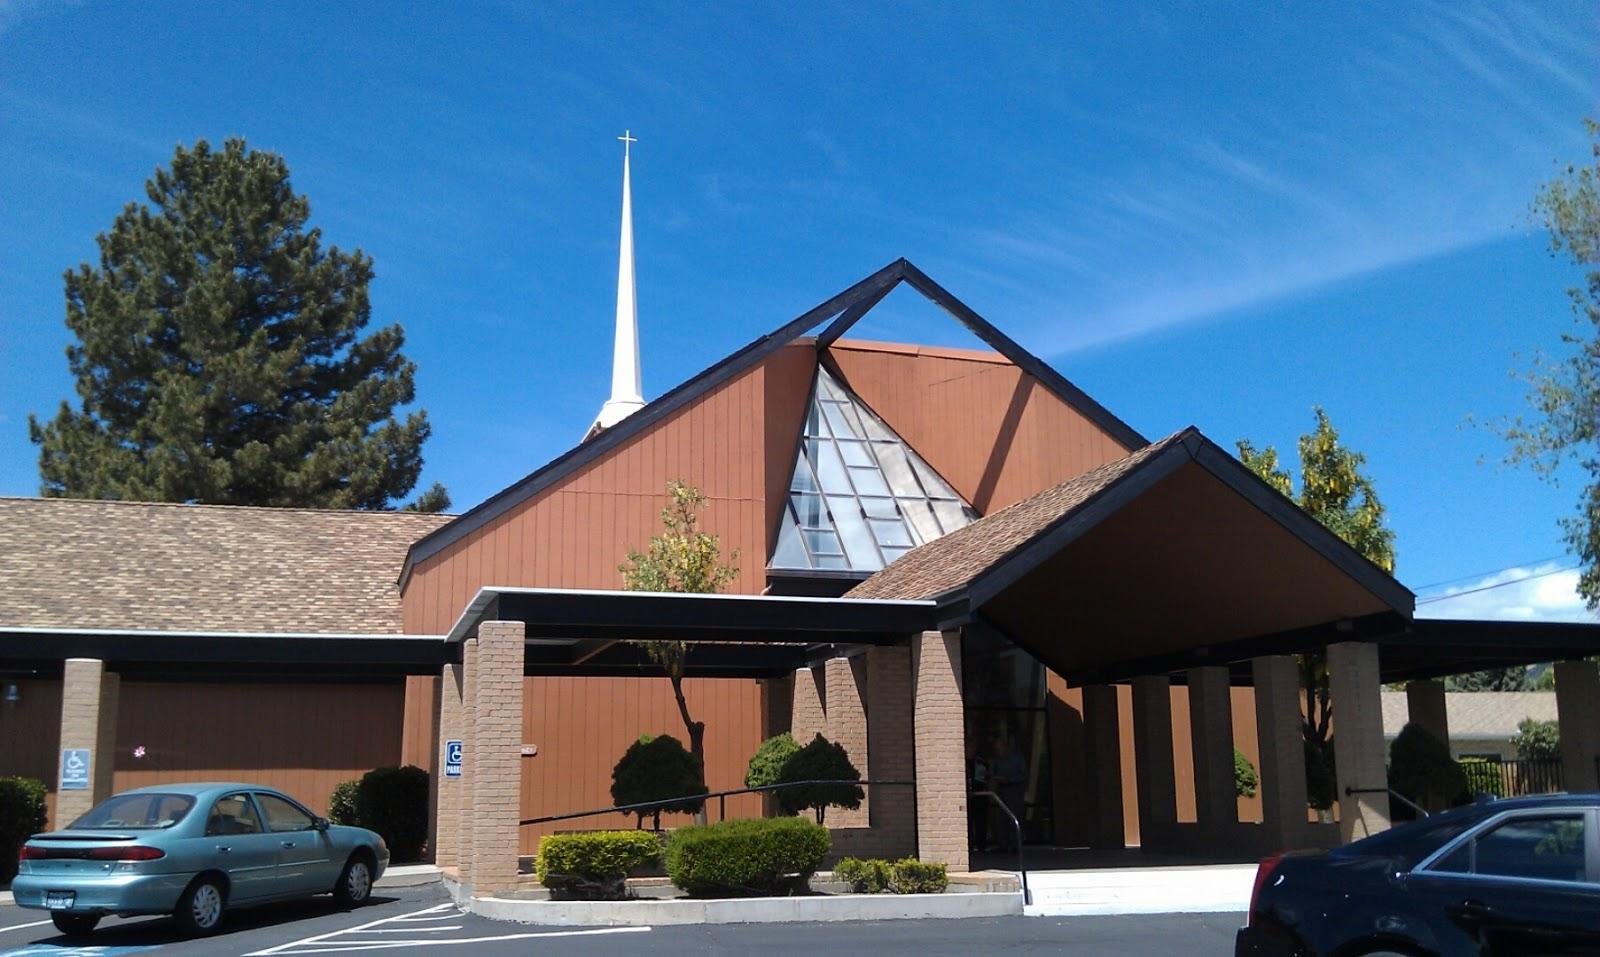 Kurt Amp Virginia S Travels Reno Sparks And Carson City